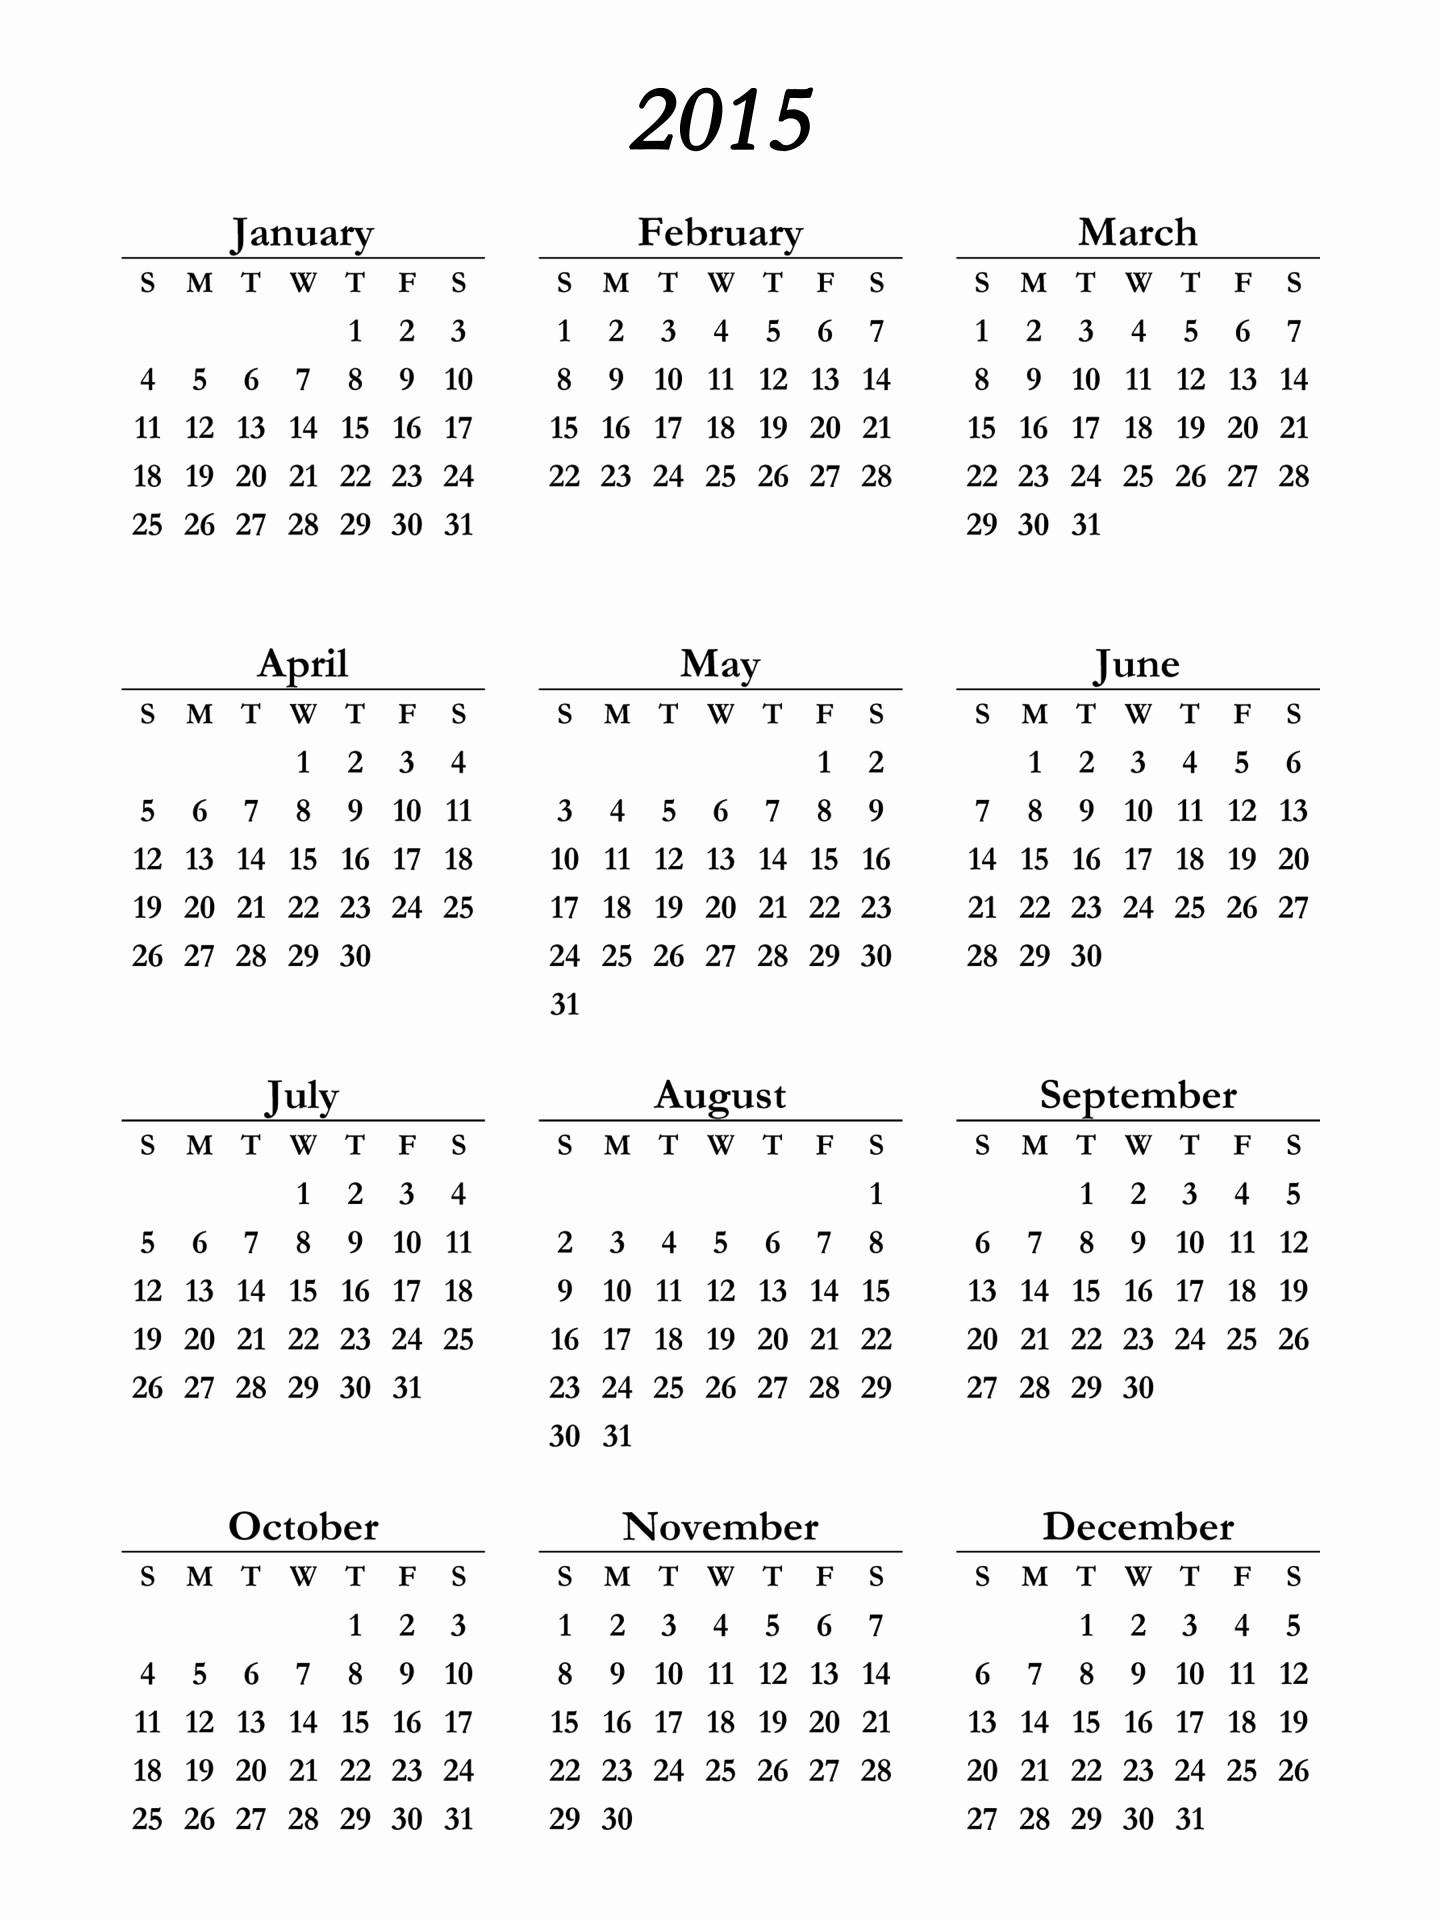 Calendar 2015 Printable with Holidays Lovely Current Information Regarding 2016 Calendar with Holidays